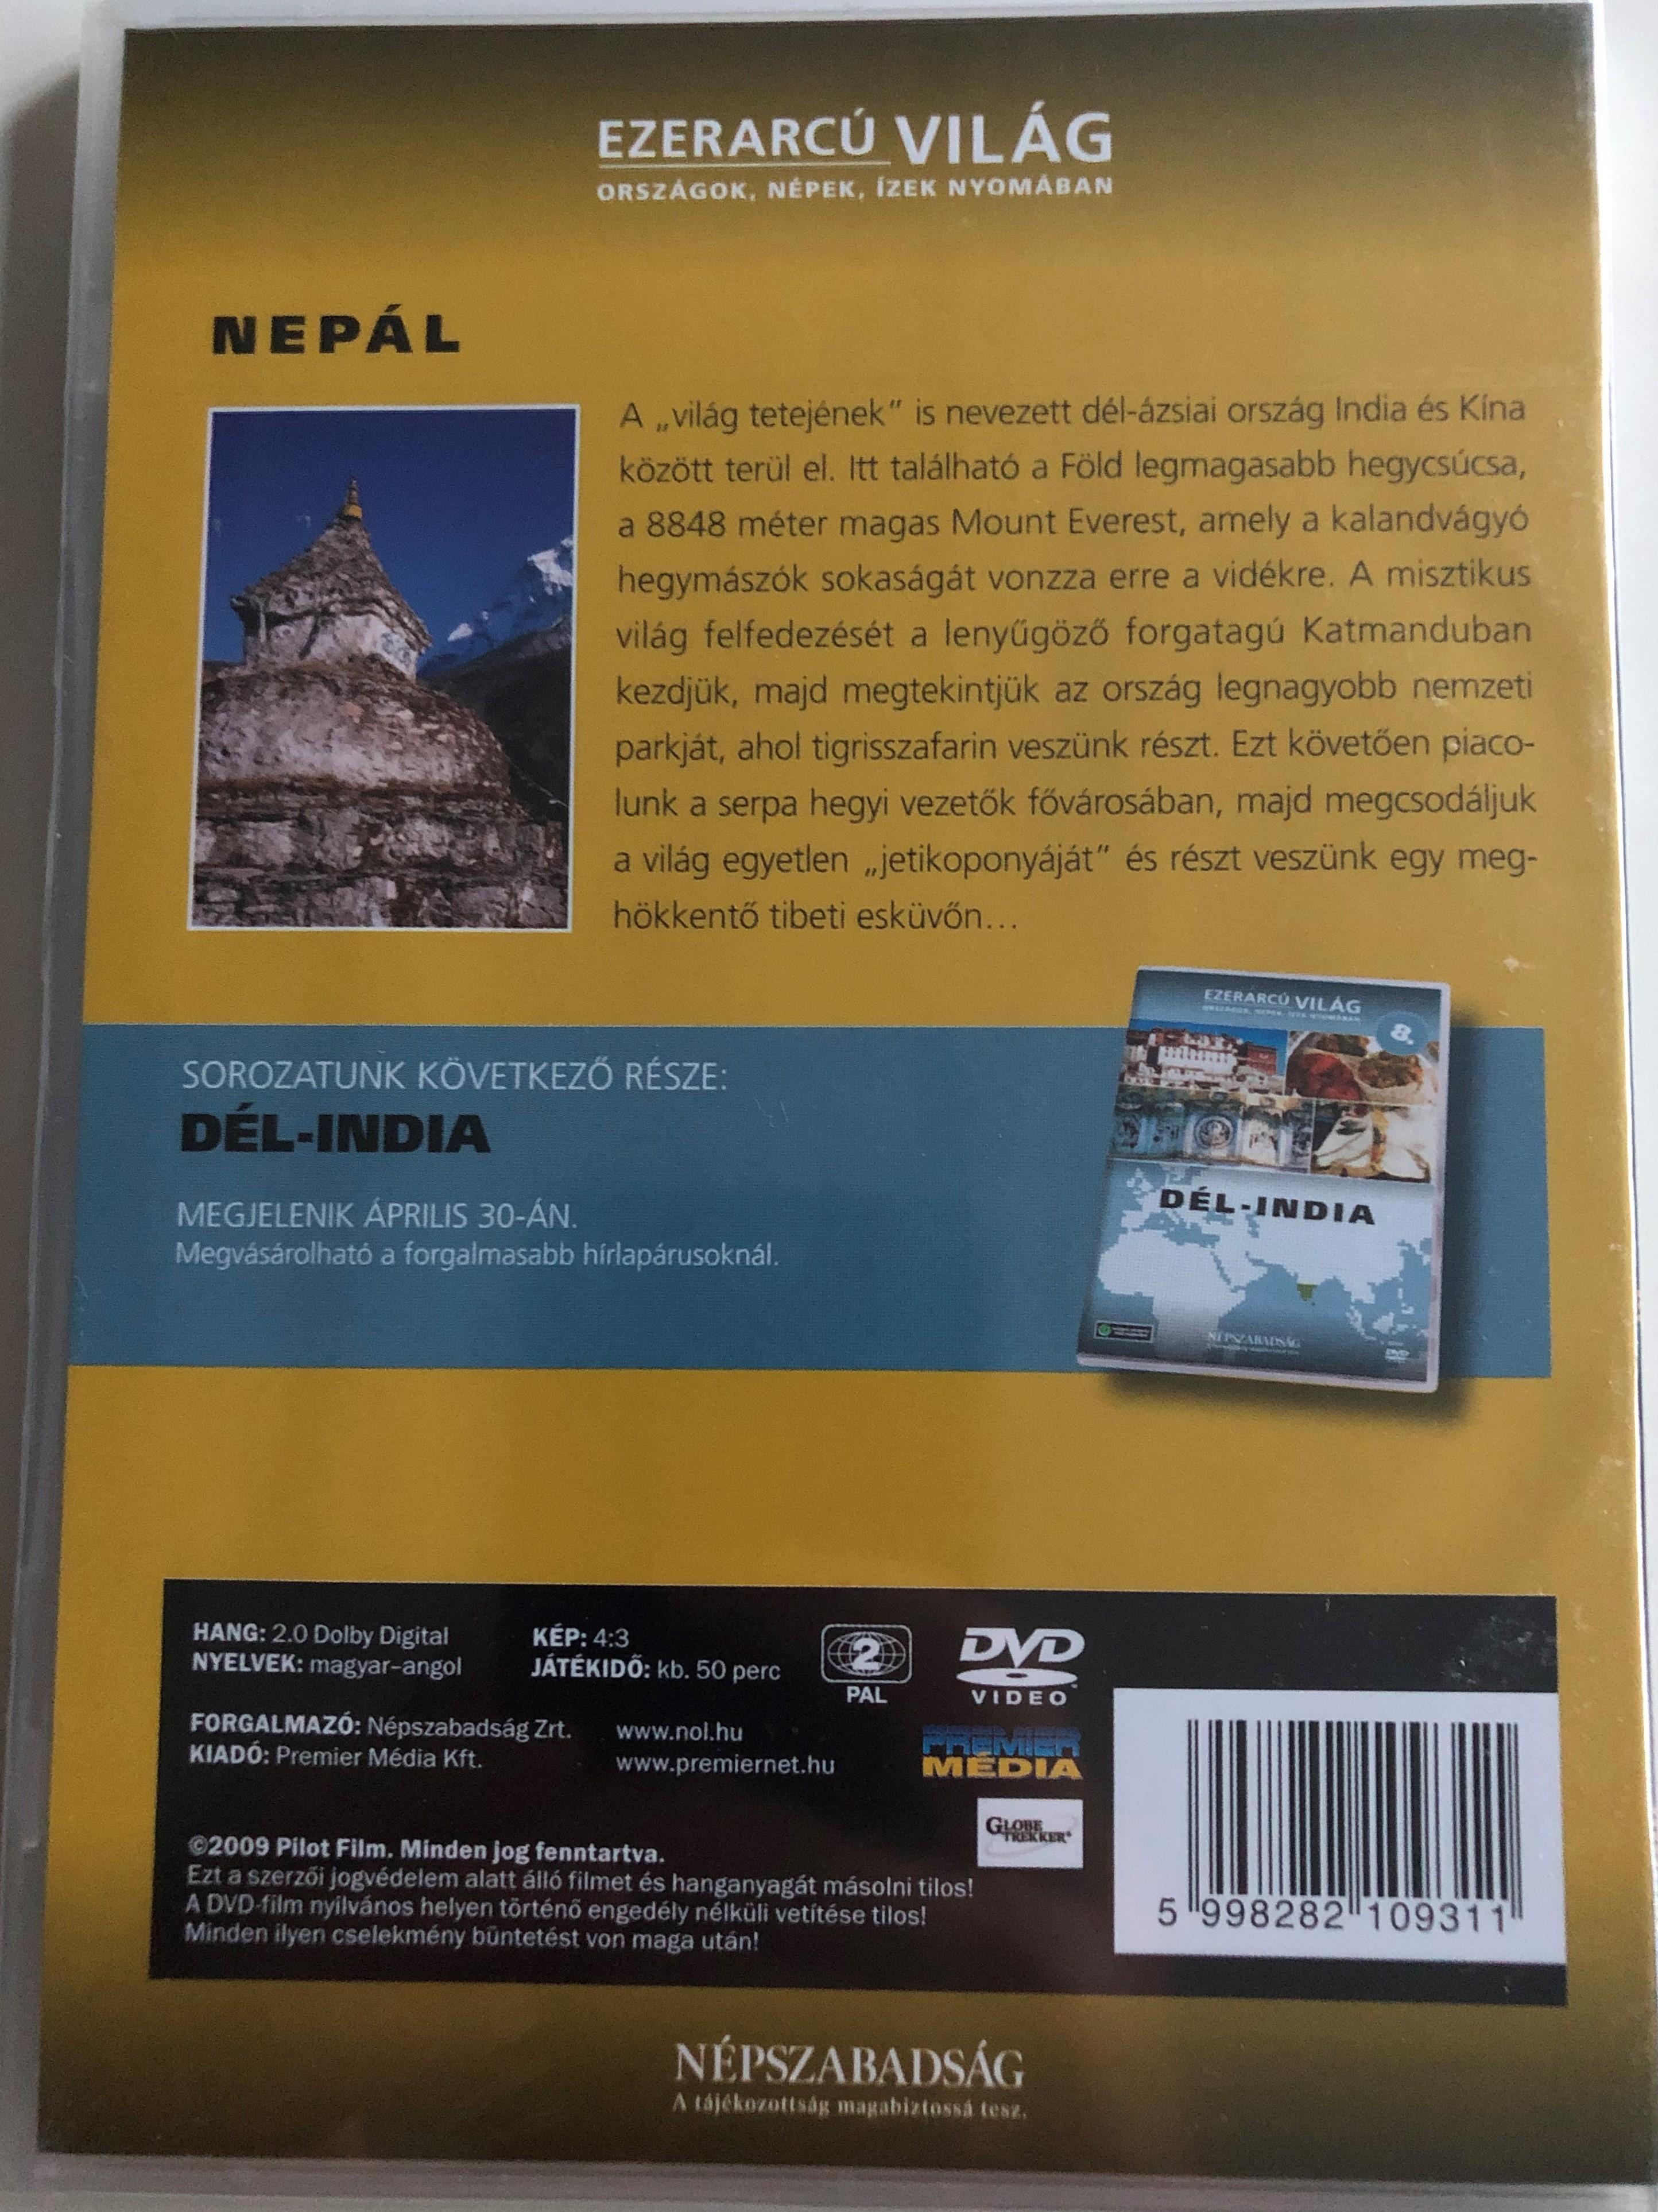 ezerarc-vil-g-vol.-7-nepal-dvd-2009-orsz-gok-n-pek-zek-nyom-ban-20-x-dvd-set-2009-n-pszabads-g-premier-media-pilot-film-documentary-series-about-our-world-2-.jpg